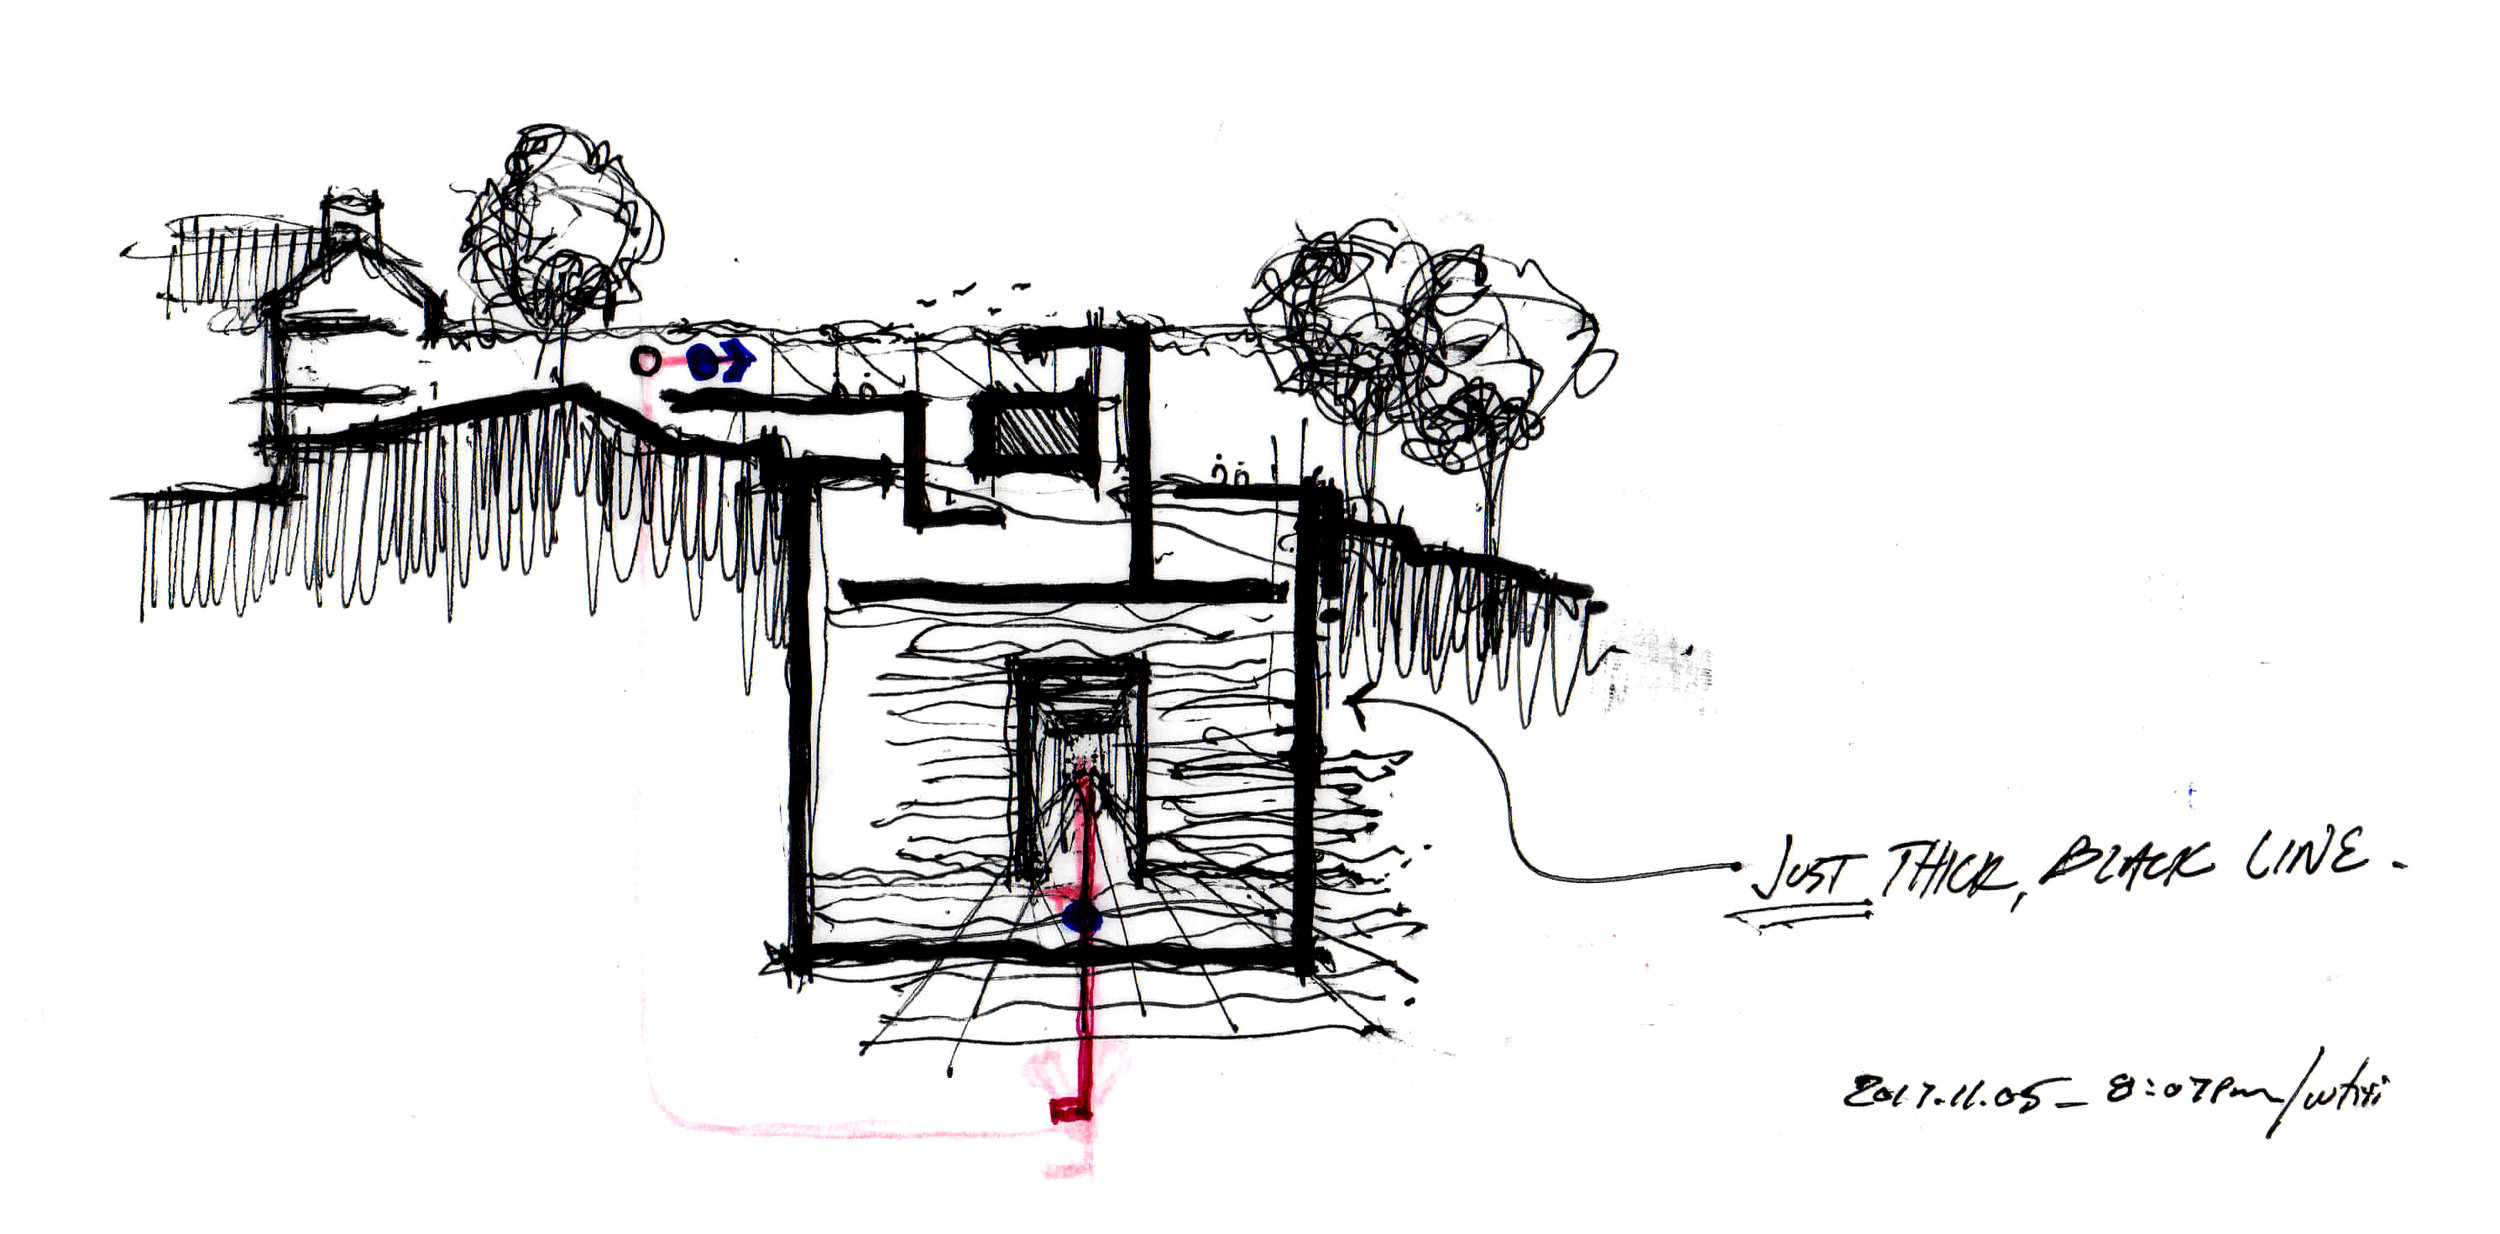 TooheyIII,William_Sketch_OldtoNewConnection_2.jpg